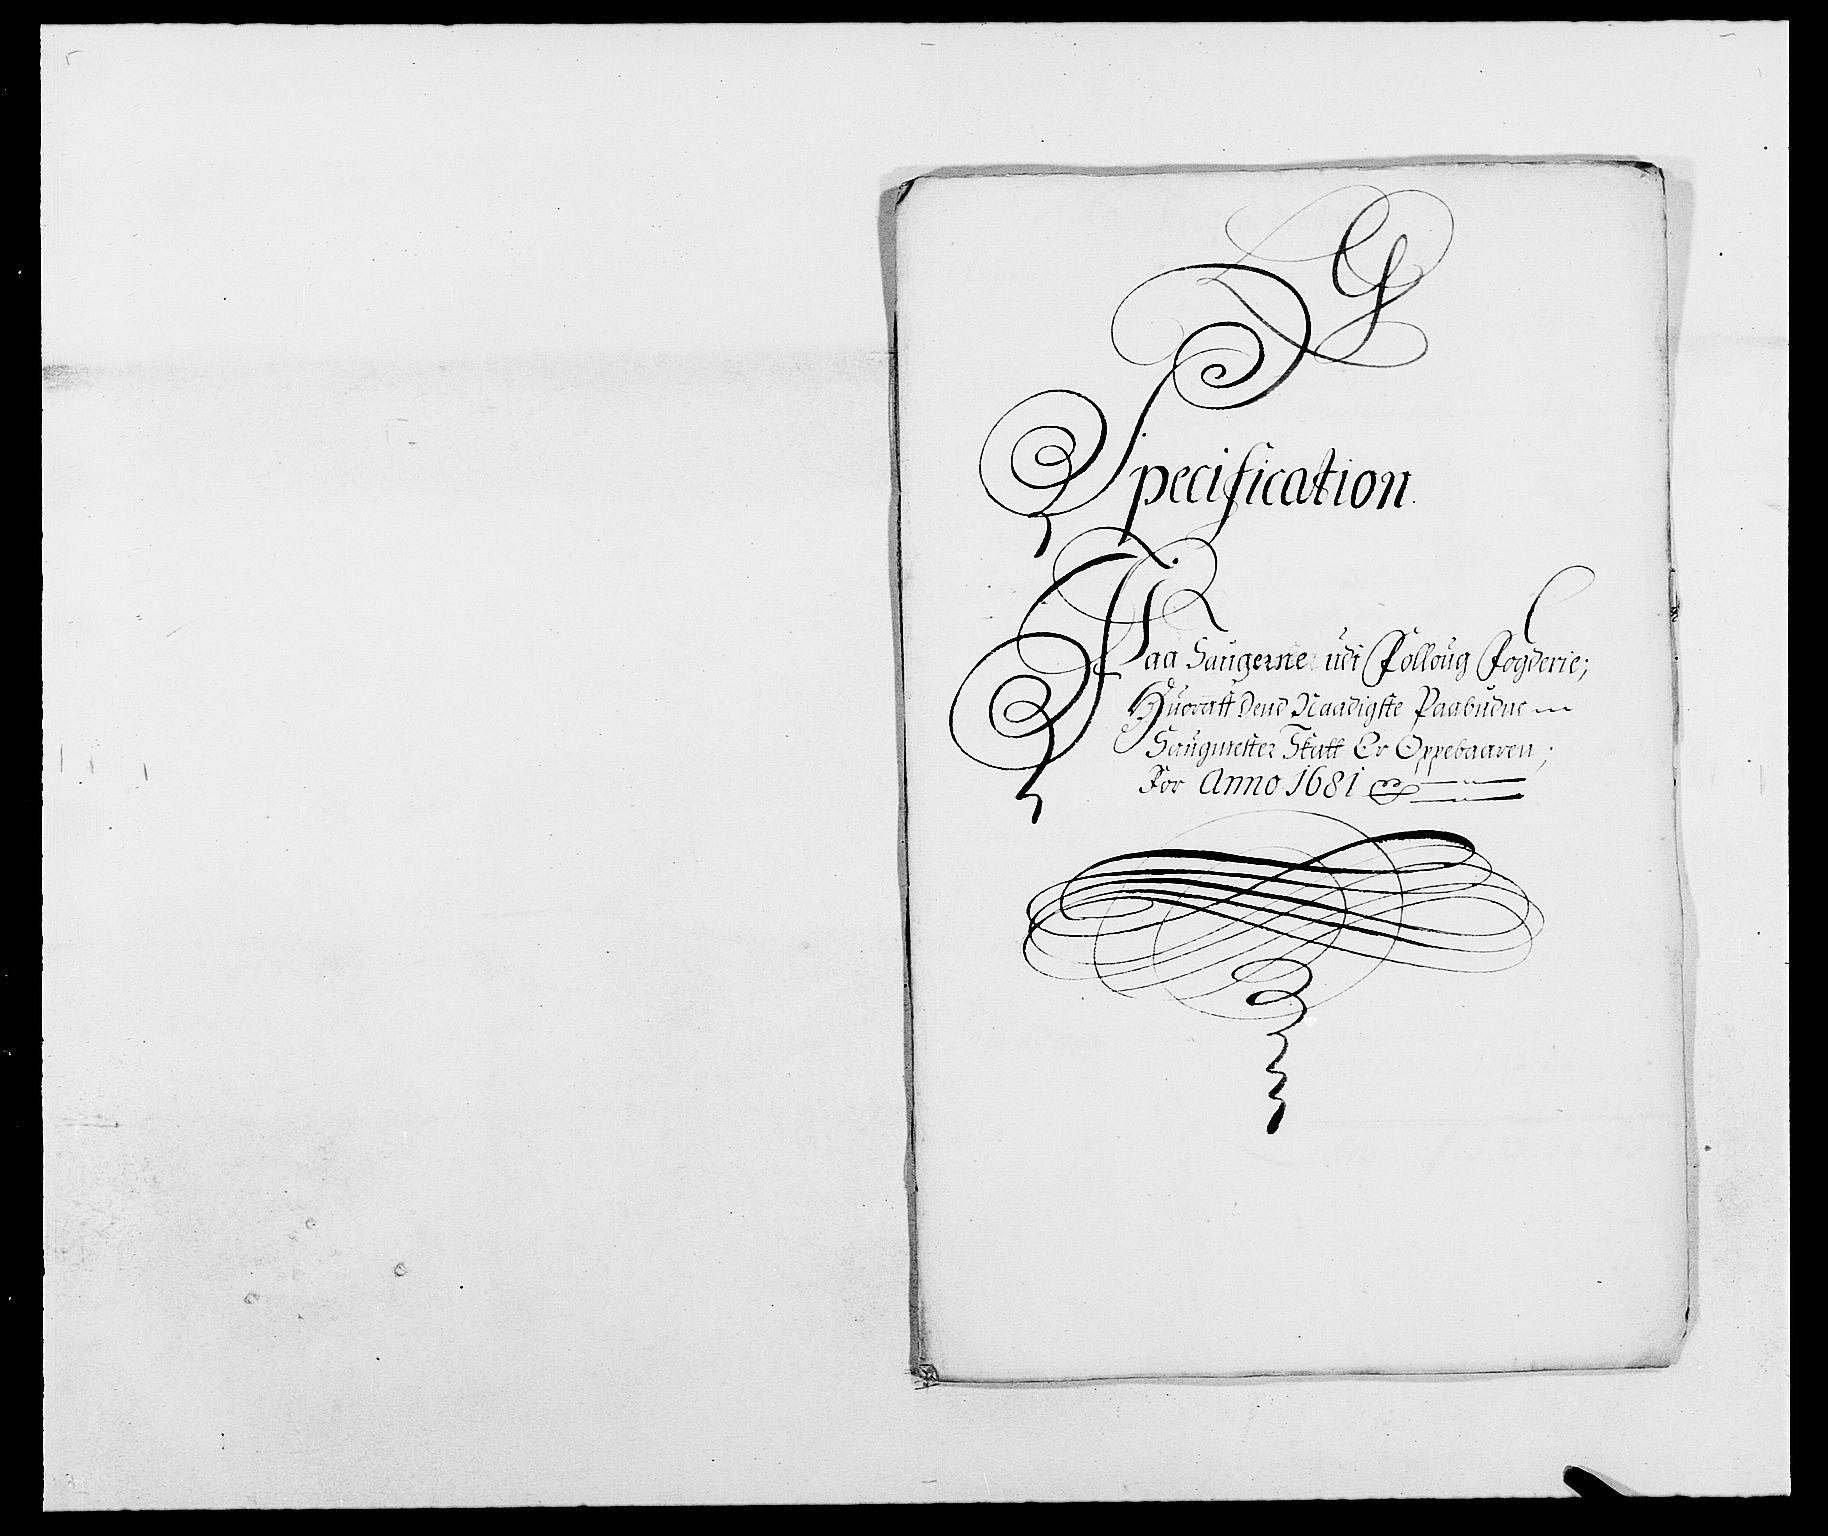 RA, Rentekammeret inntil 1814, Reviderte regnskaper, Fogderegnskap, R09/L0429: Fogderegnskap Follo, 1680-1681, s. 371